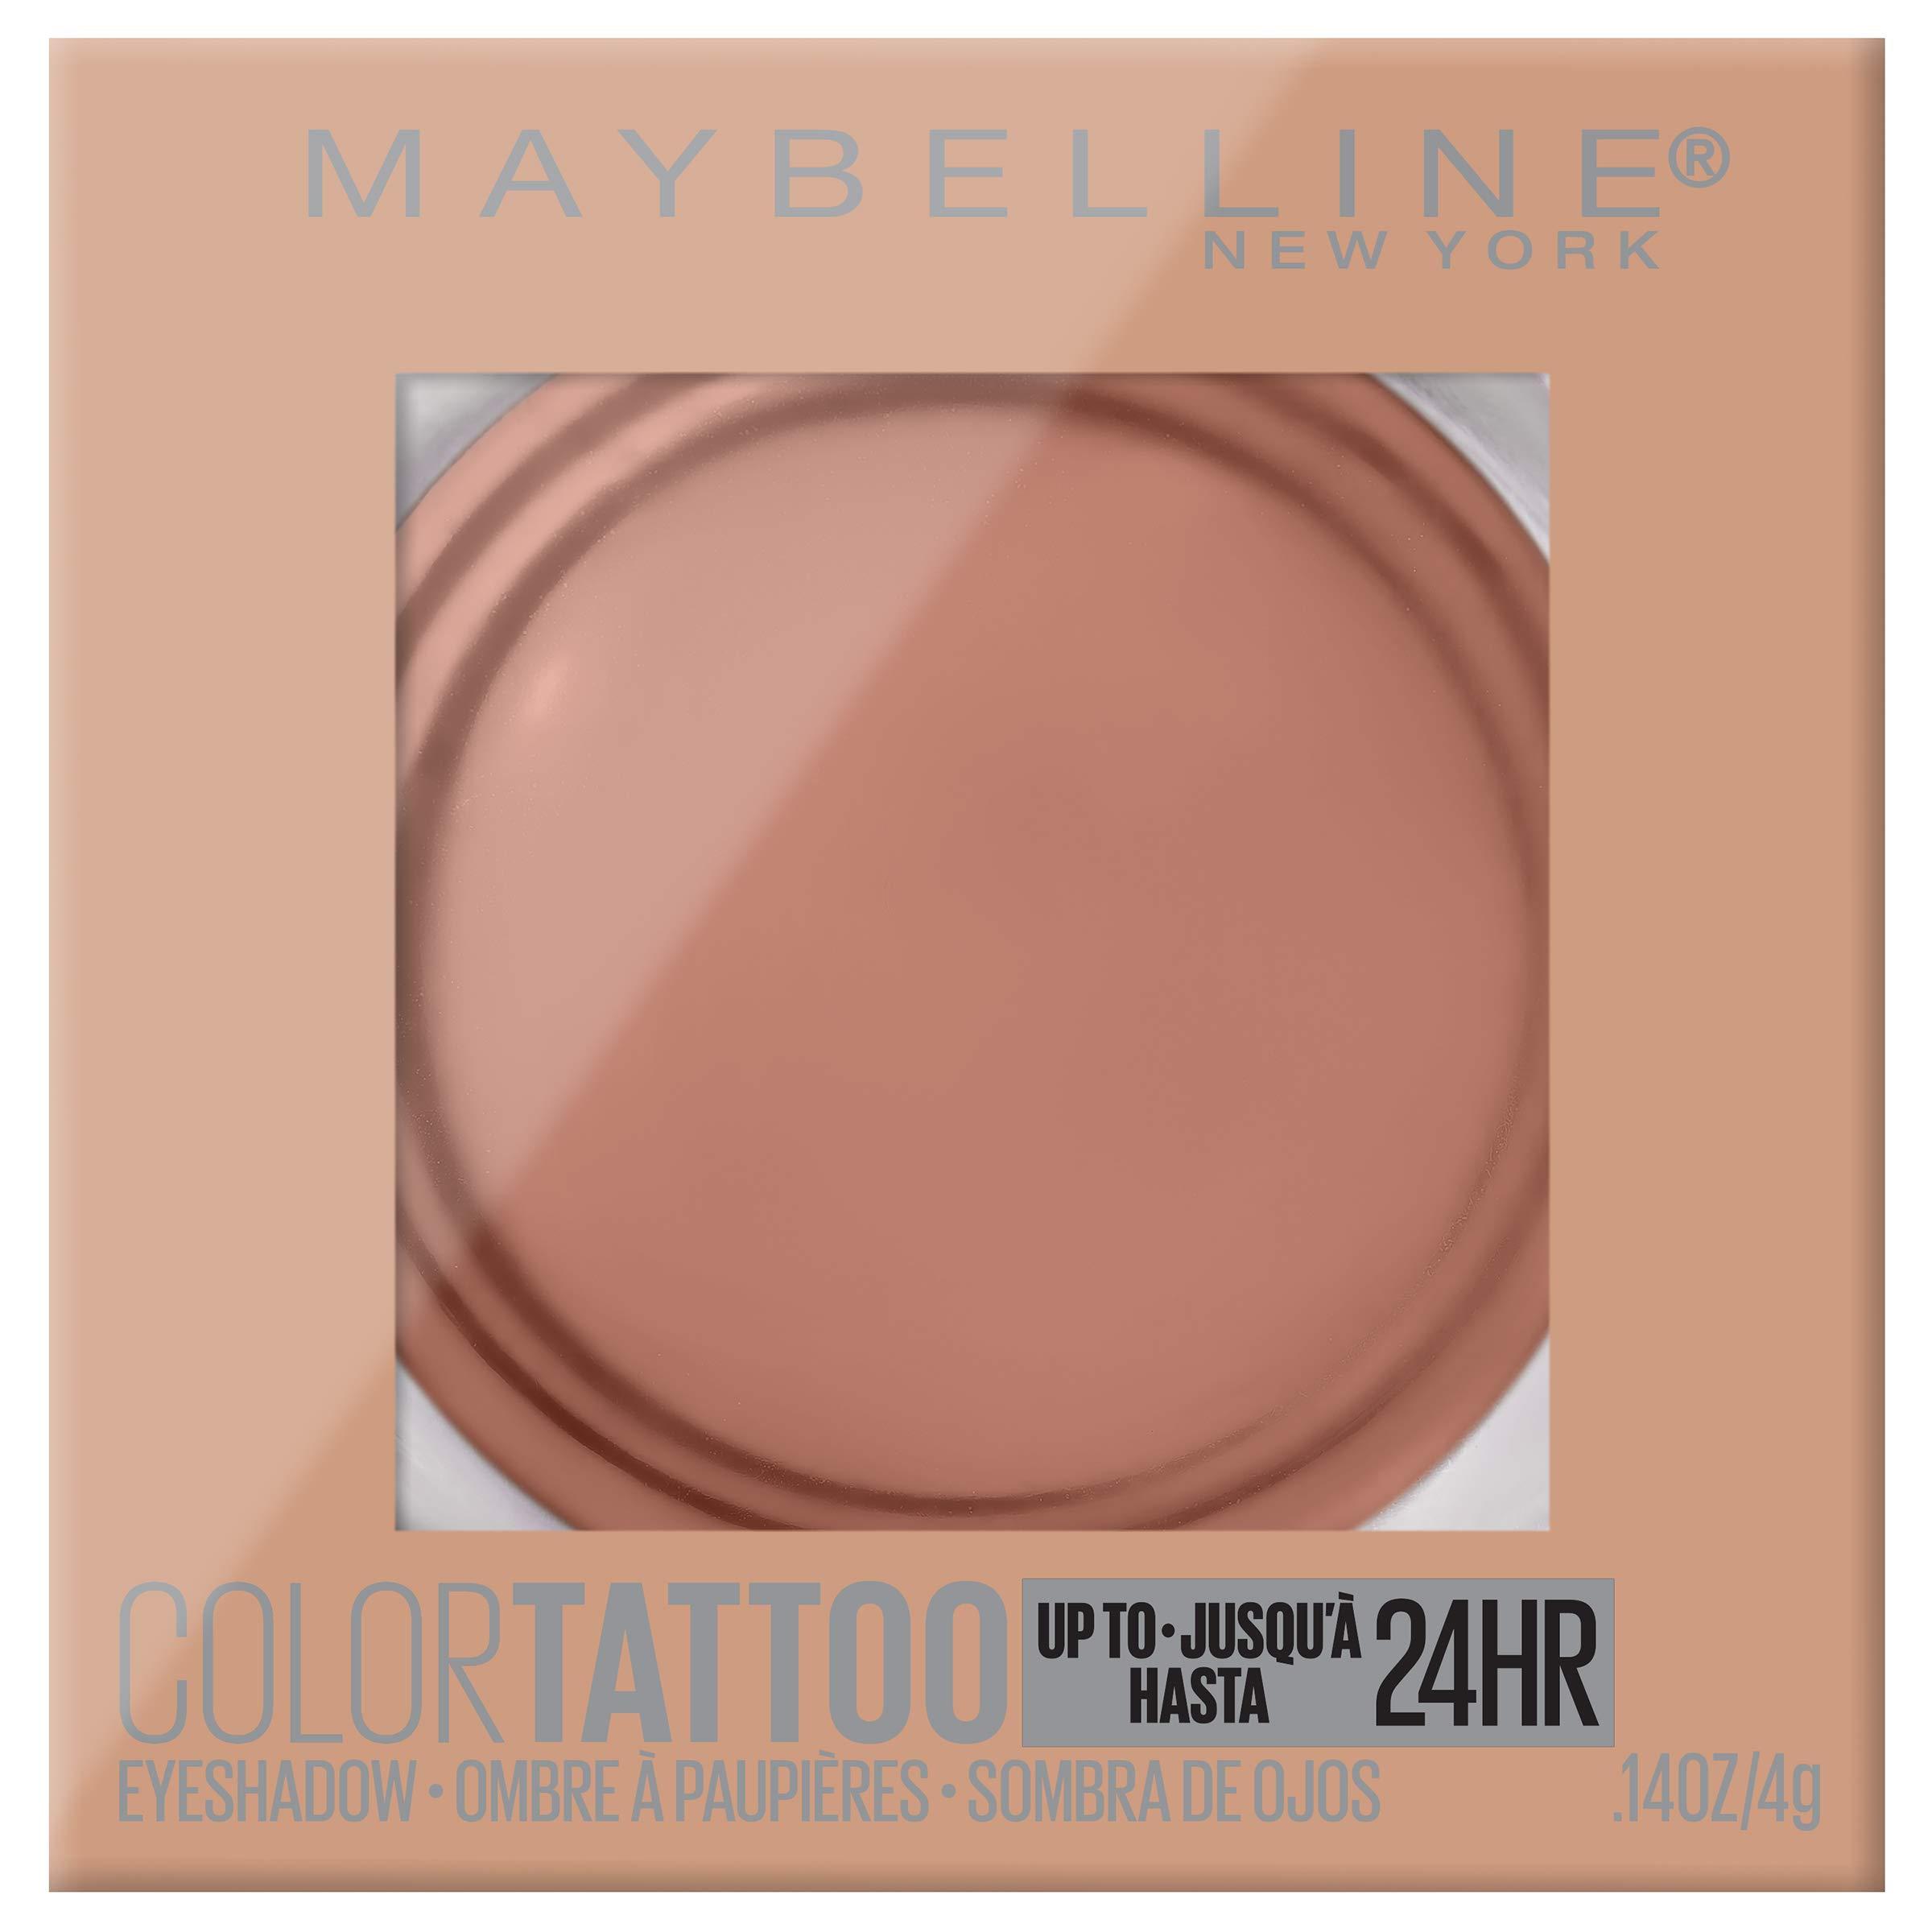 Maybelline New York Color Tattooup to 24Hr Longwear Waterproof Fade Crease Resistant Blendable Cream Eyeshadow Pots Makeup, Urbanite, 0.14 oz